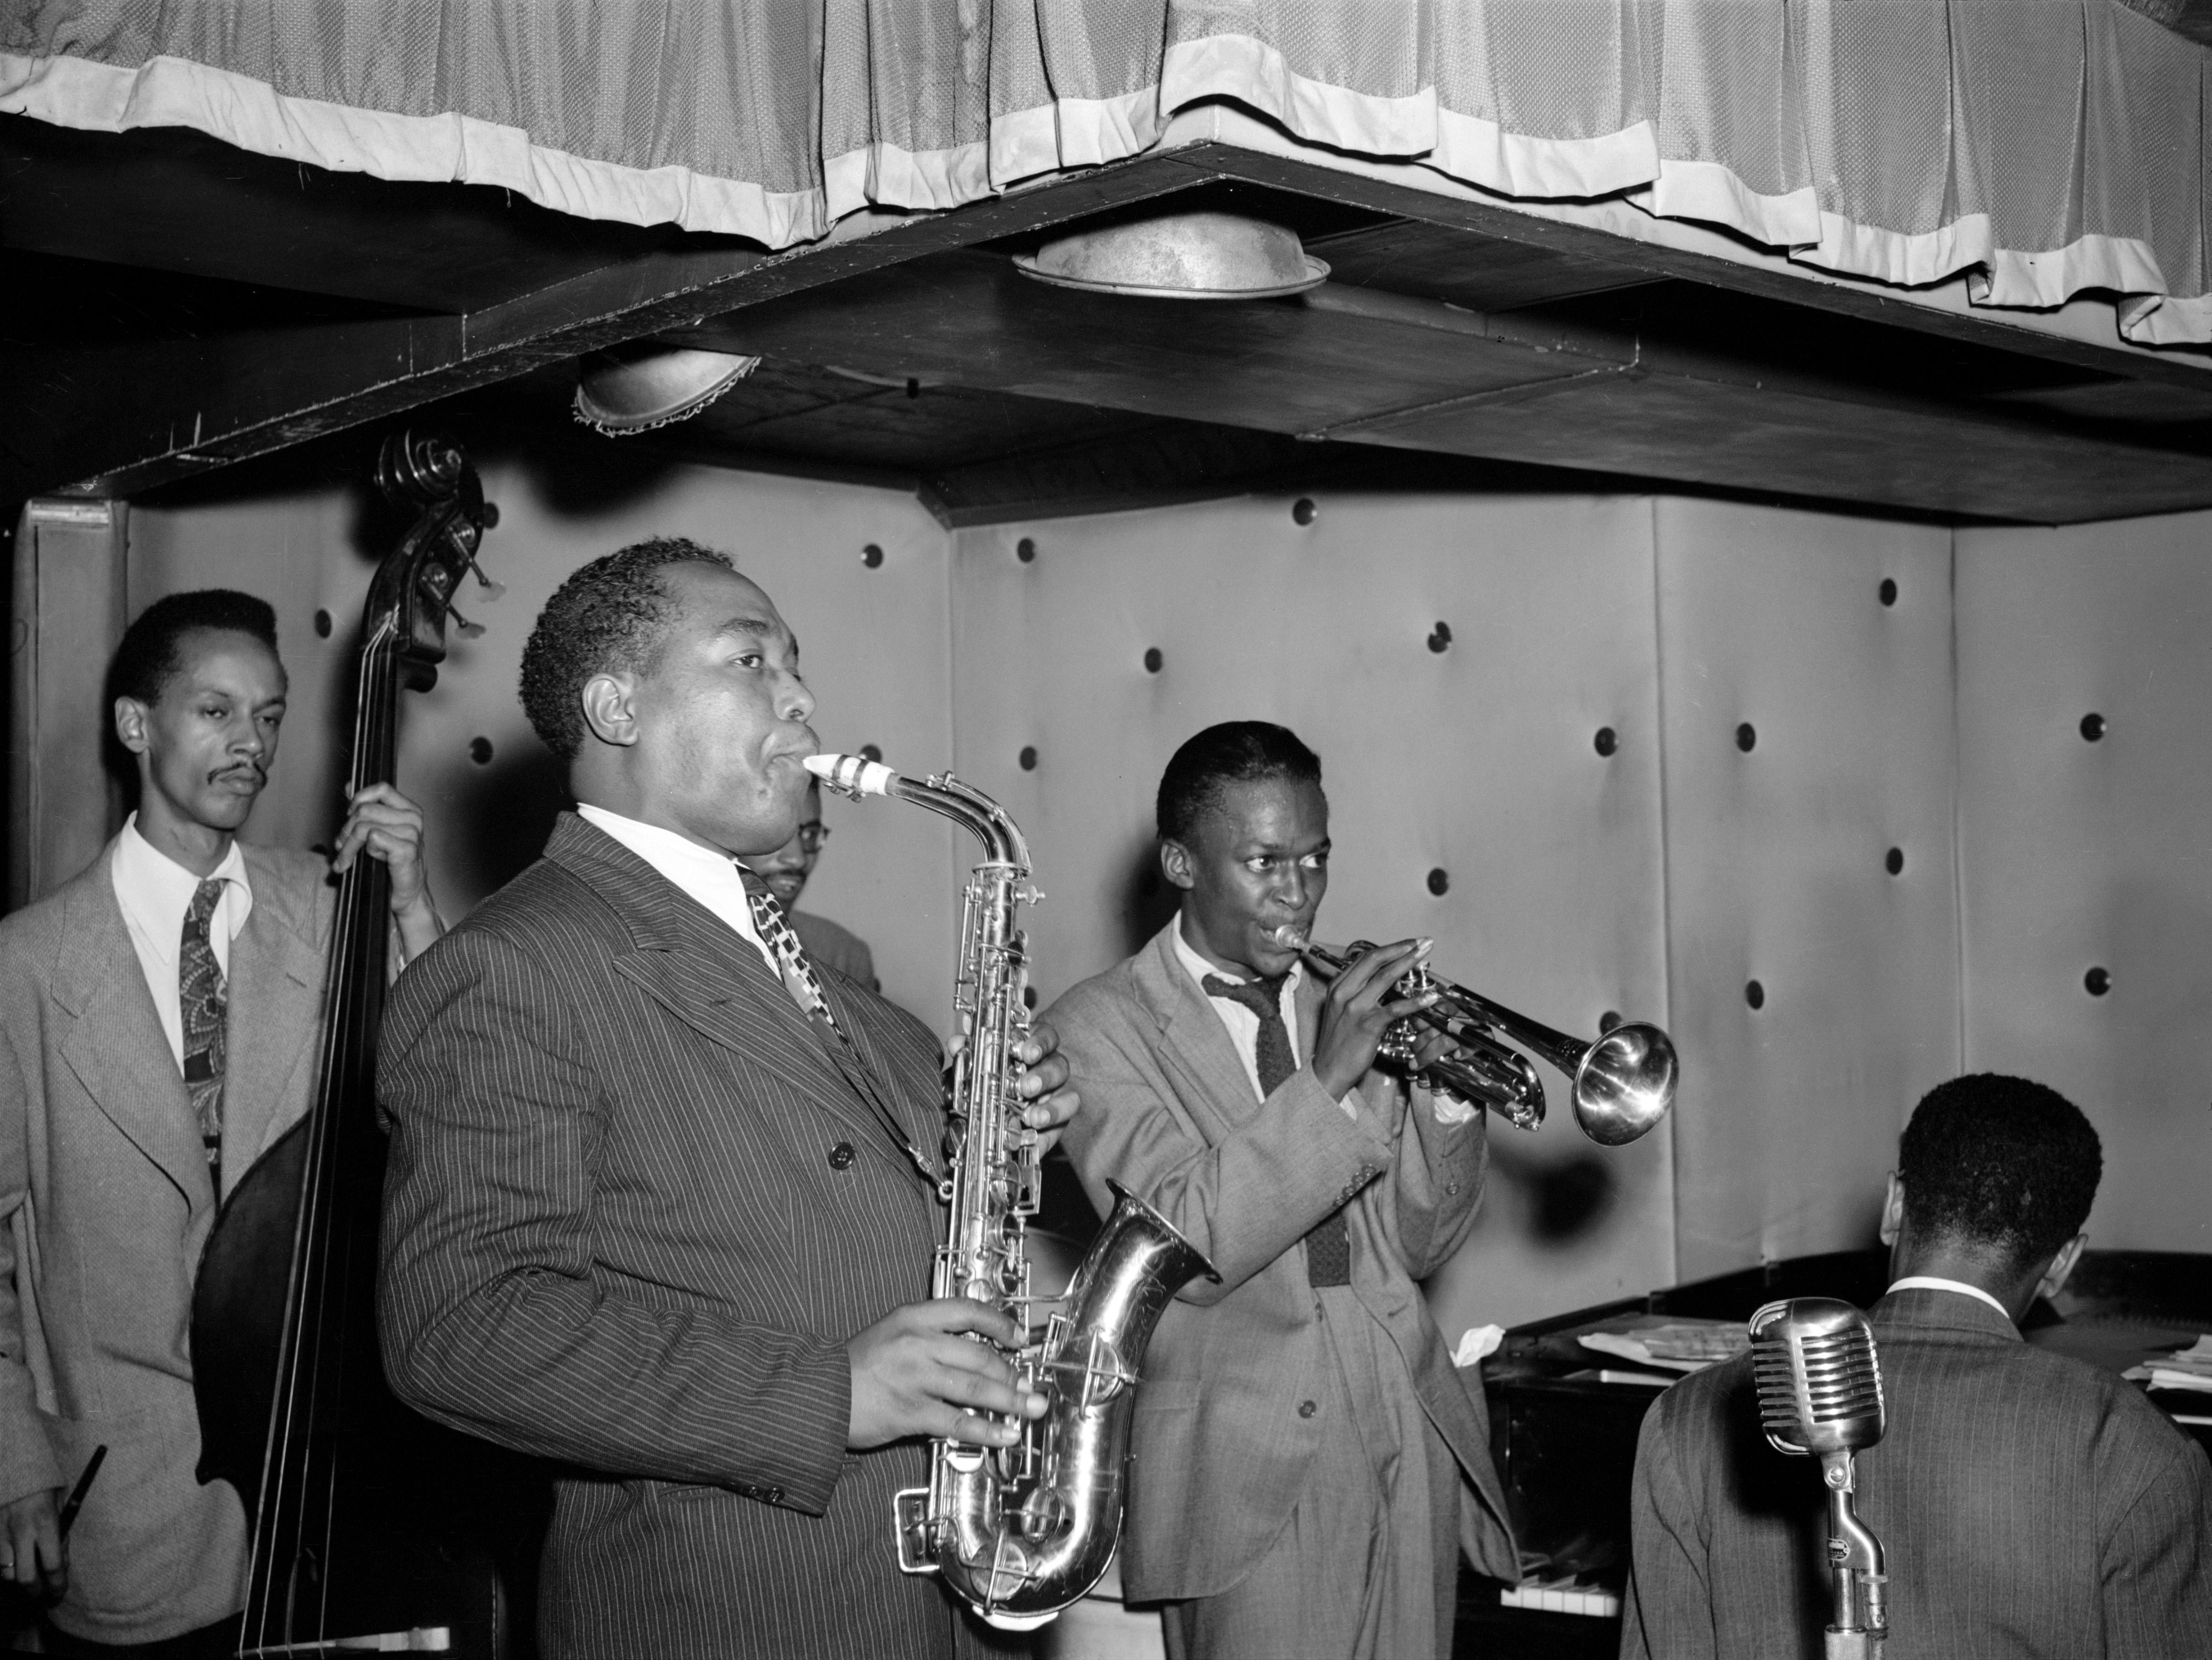 Swing (jazzmuziek)